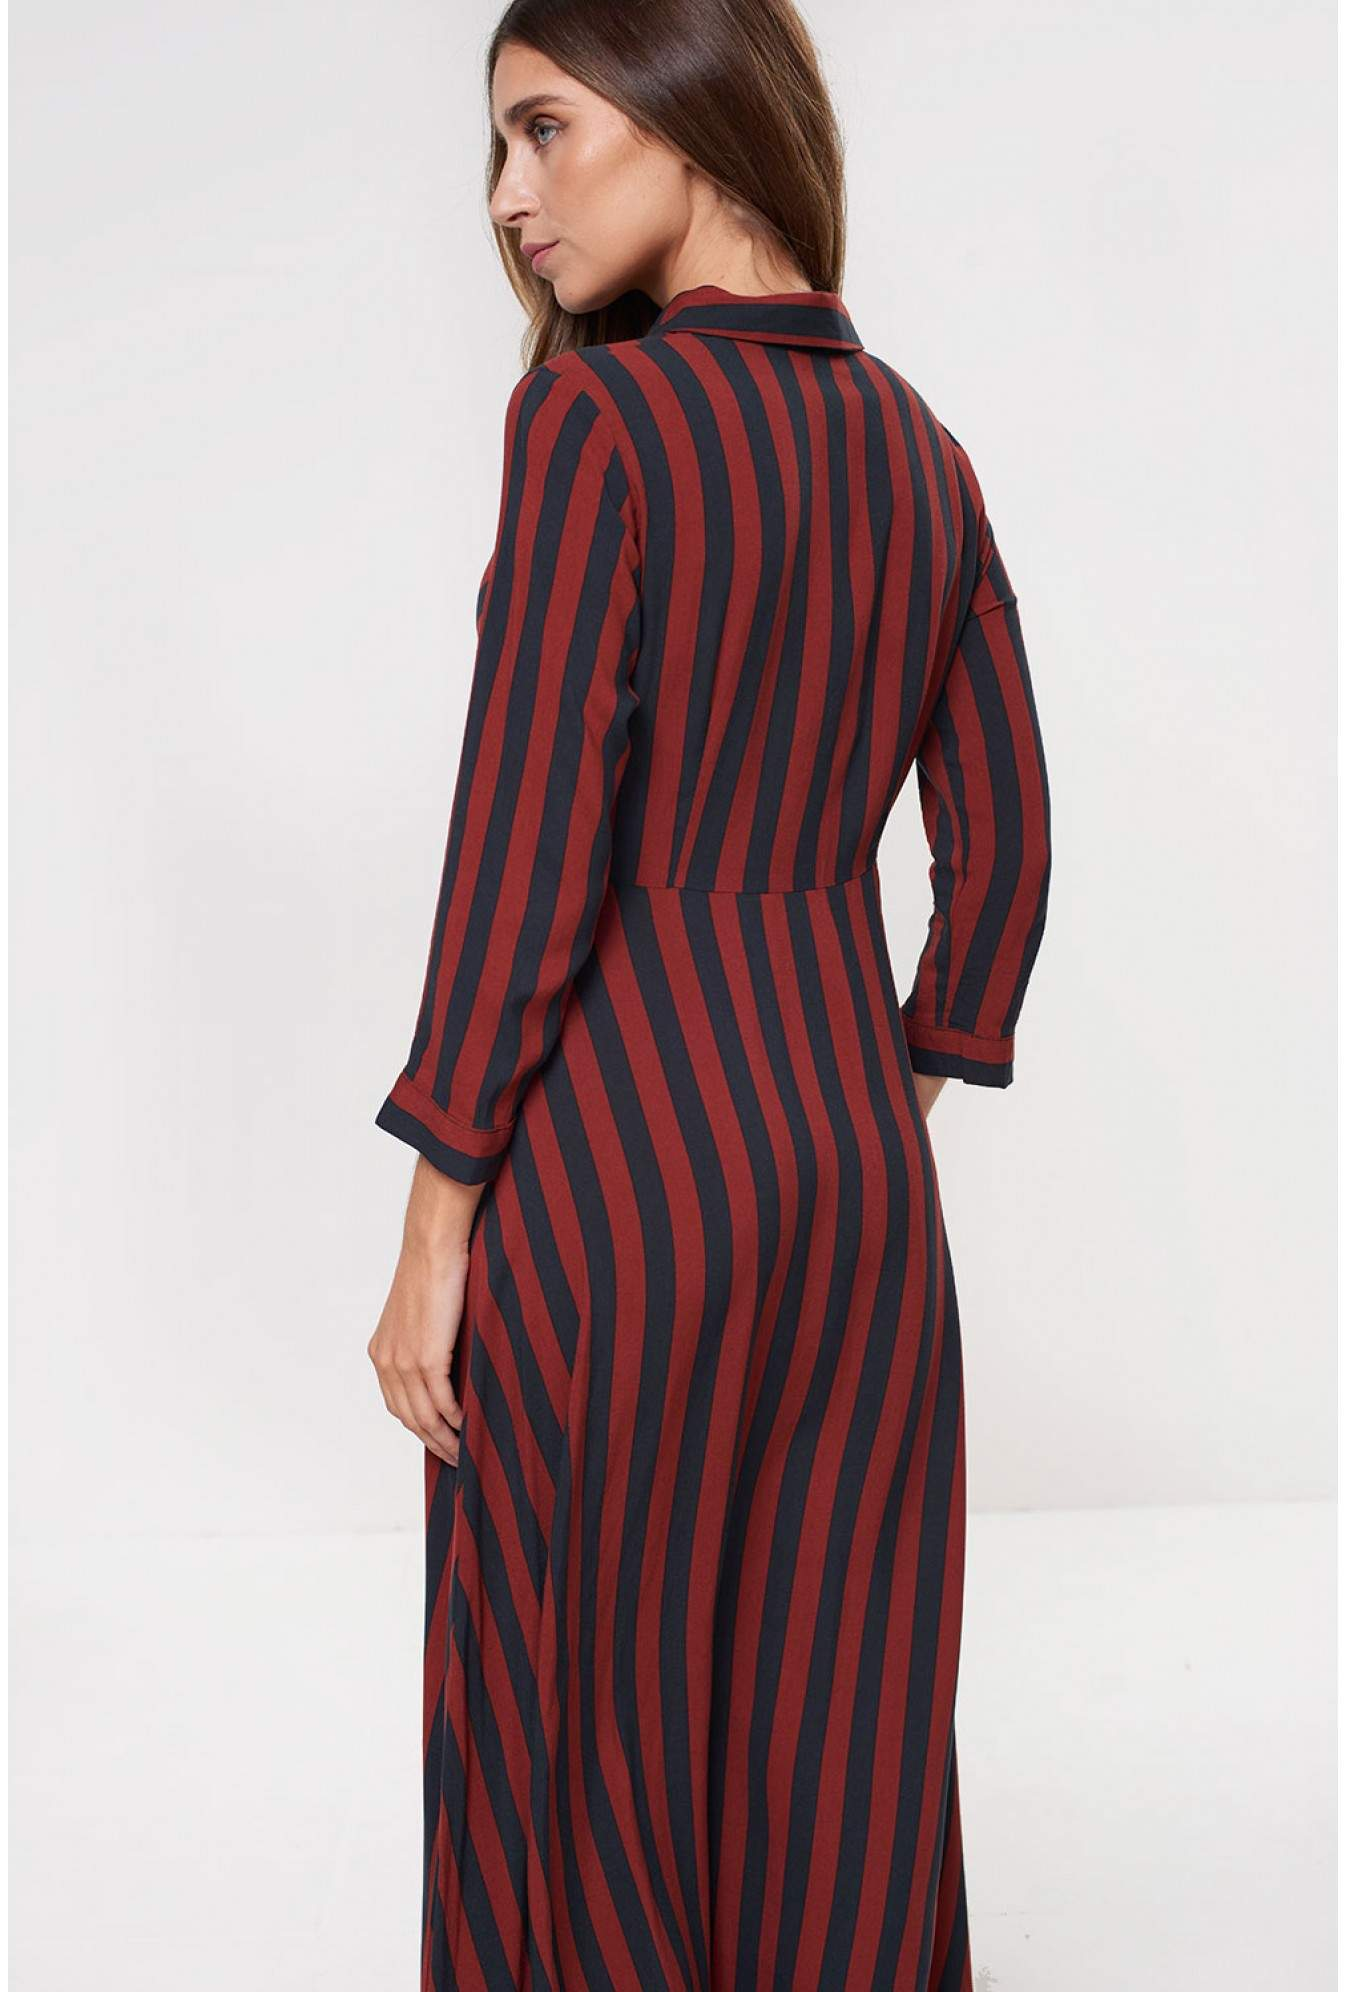 4d98504bac69f2 More Views. Savanna Long Sleeve Shirt Dress in Navy Stripe. YAS